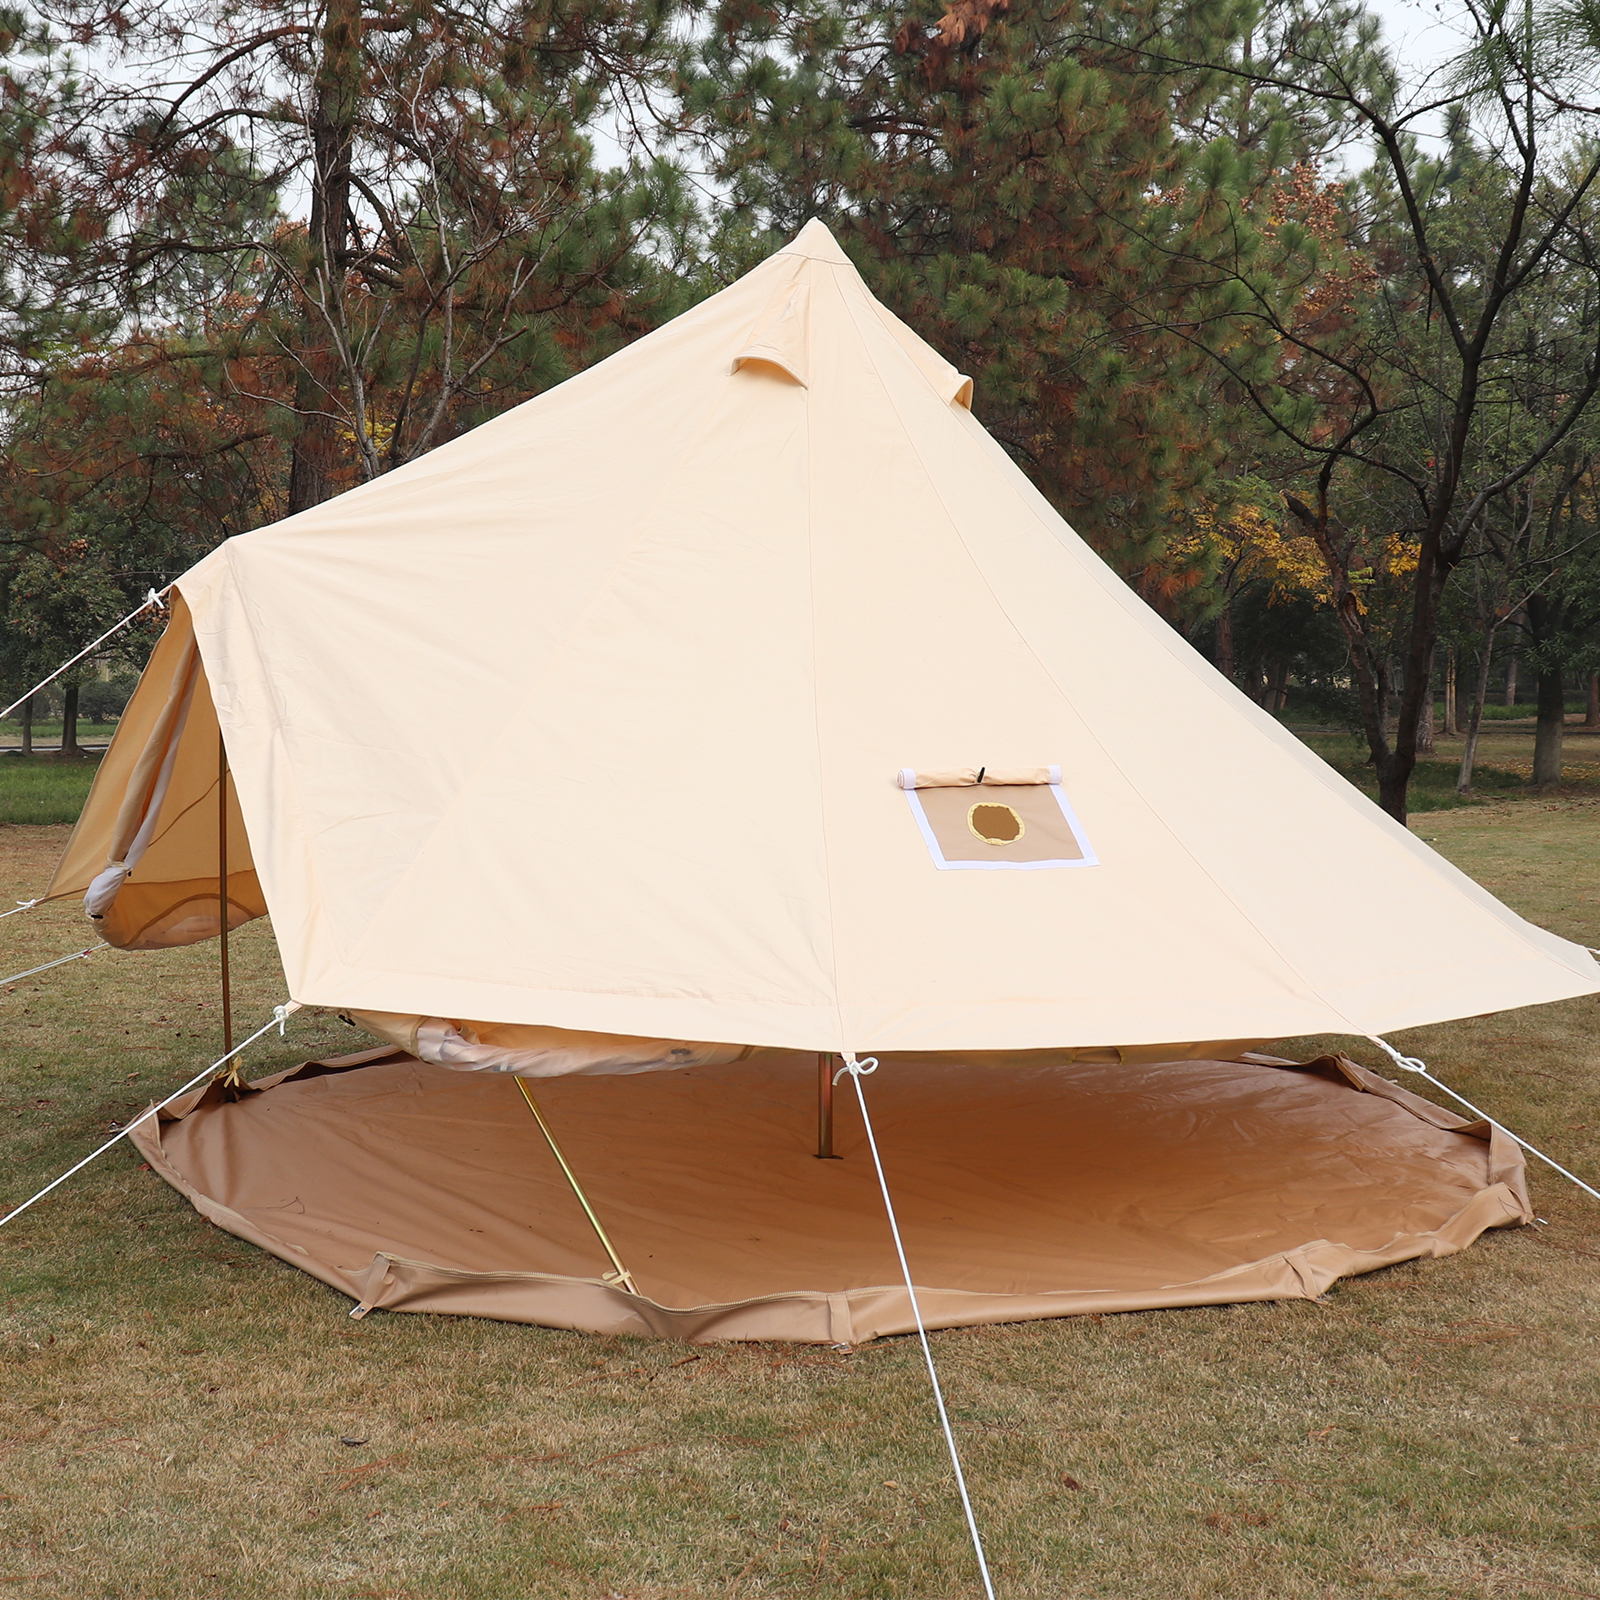 4-Season-Bell-Tent-3-4-5-6M-Waterproof-Cotton-Canvas-Glamping-Camping-Beach-US thumbnail 35